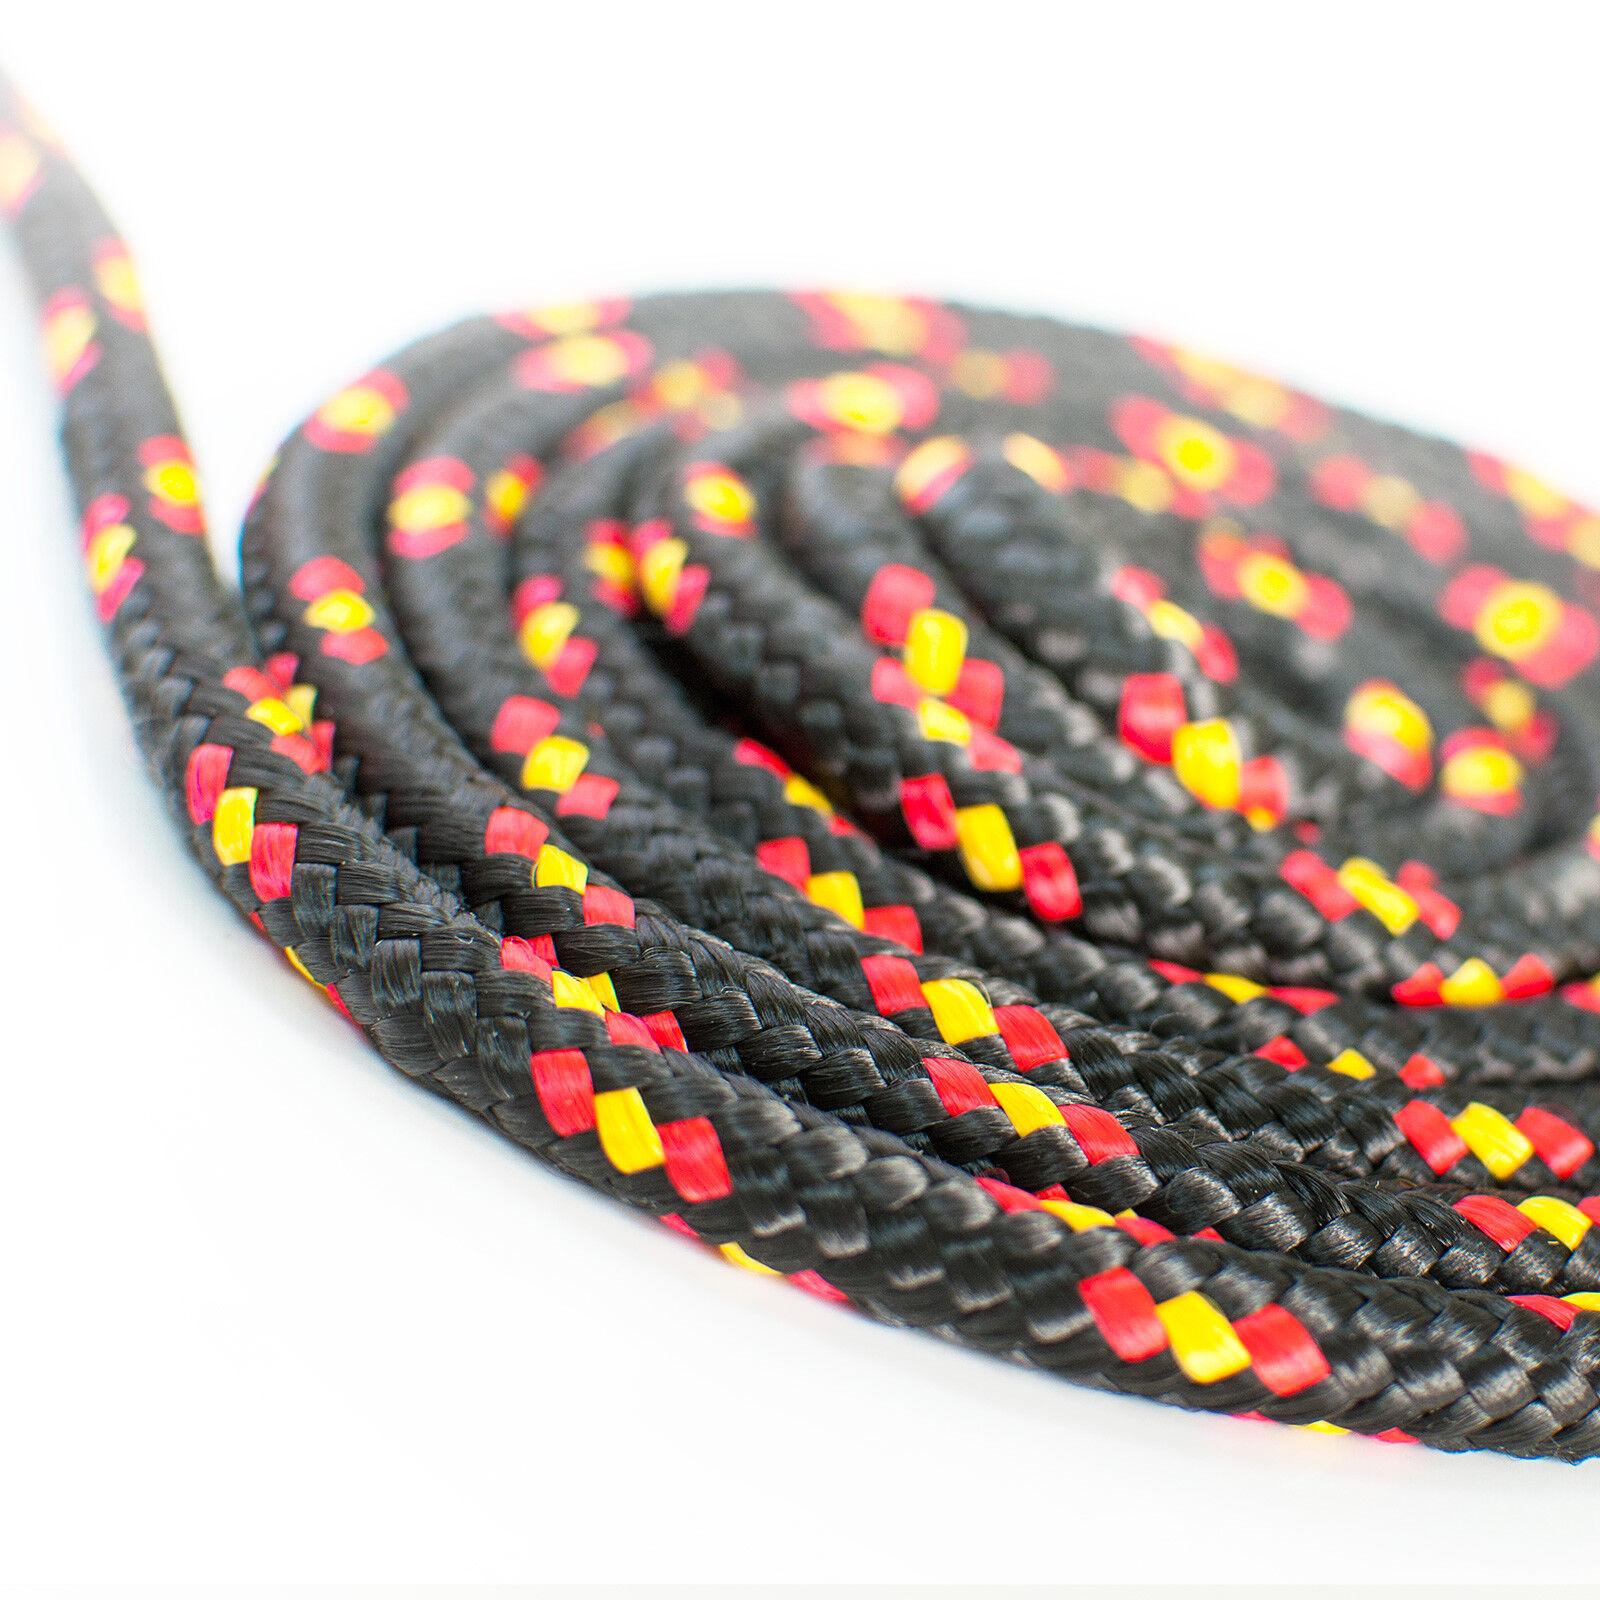 Tauseil versch. Farben bunt Polypropylenseil Schnur Tau Seile Seile Tau Polypropylen 1d14ae